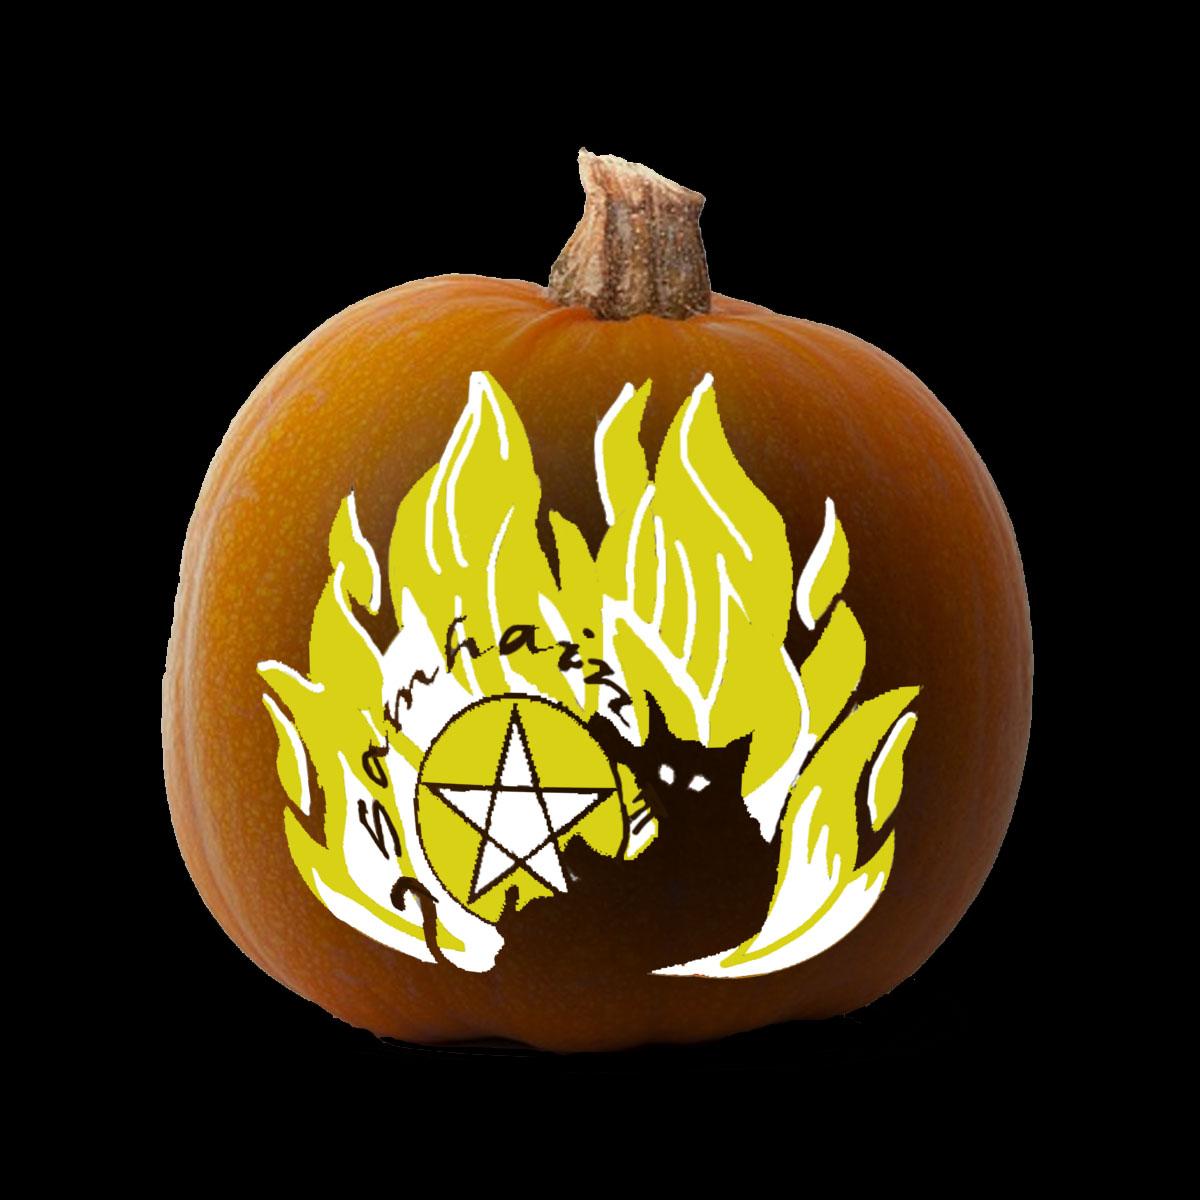 More Printable Pagan Pumpkin Carving Stencils for Samhain